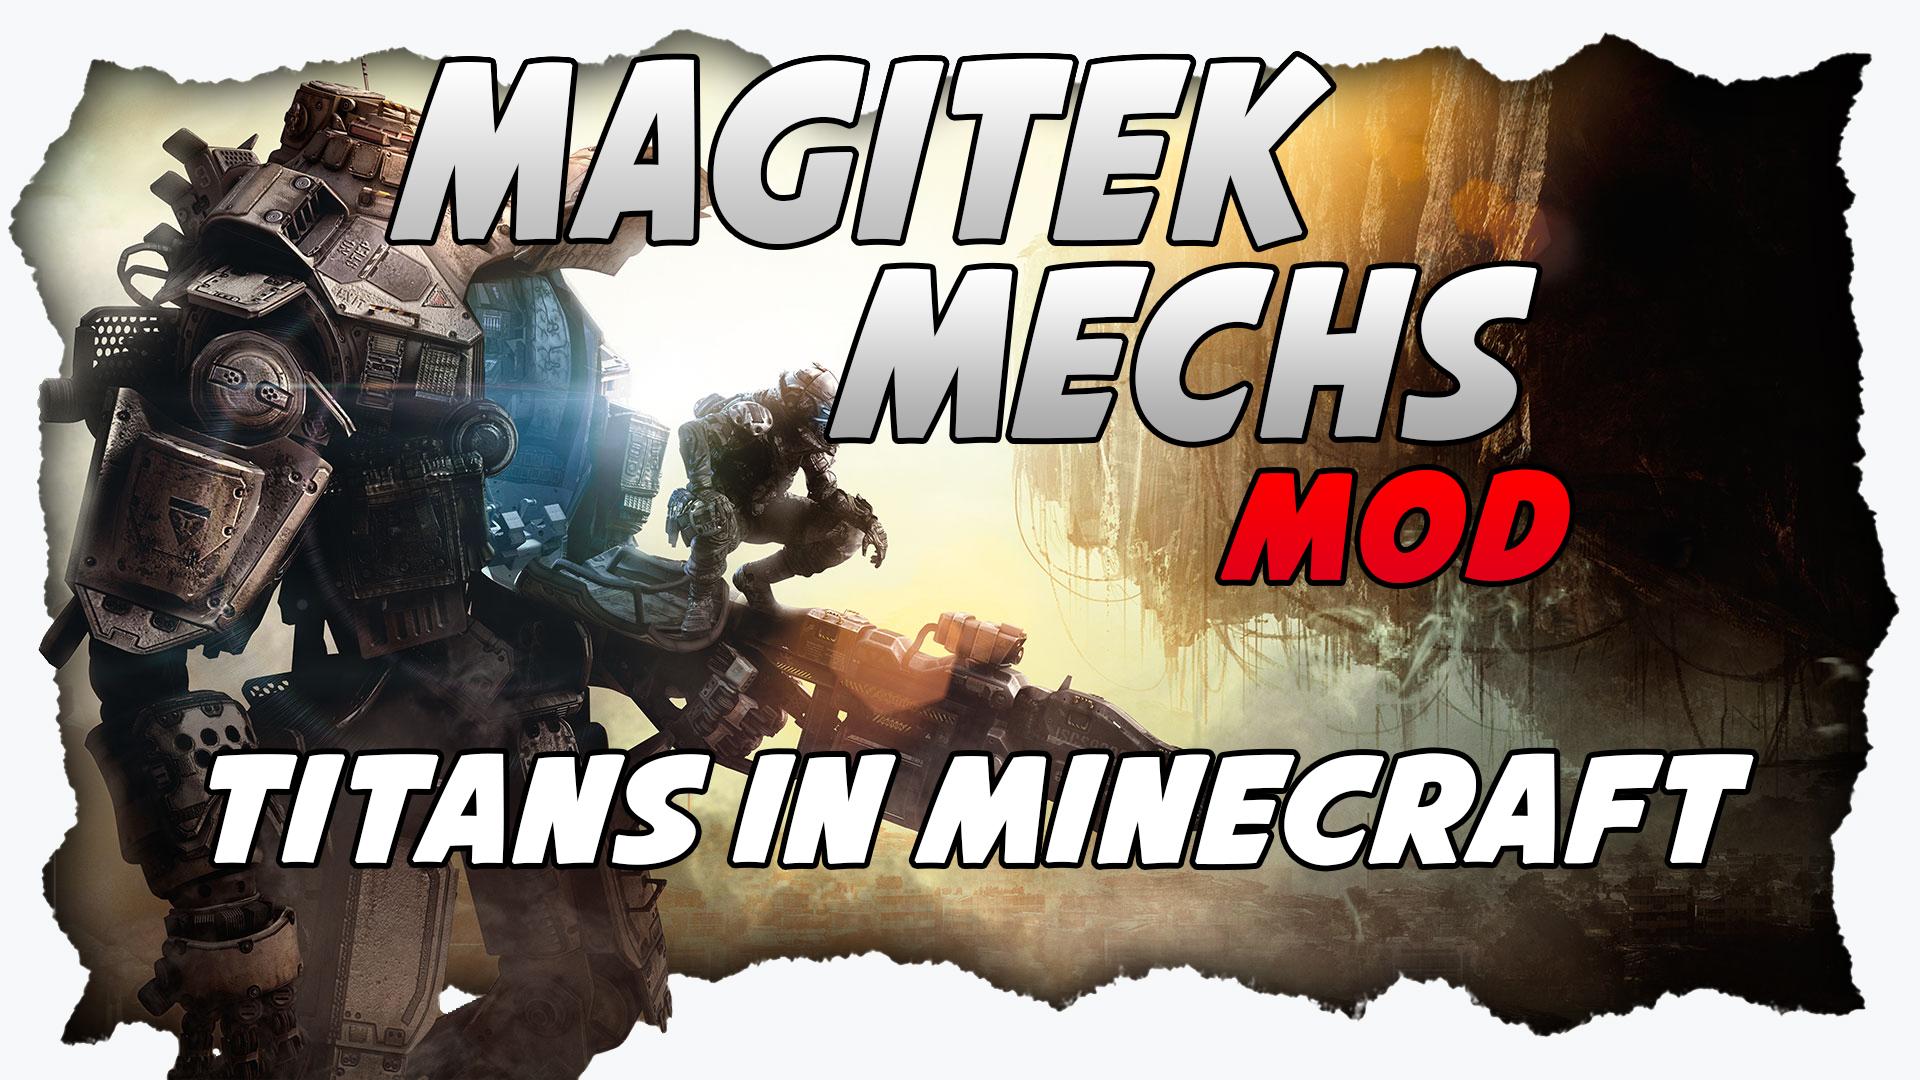 Magitek Mechs